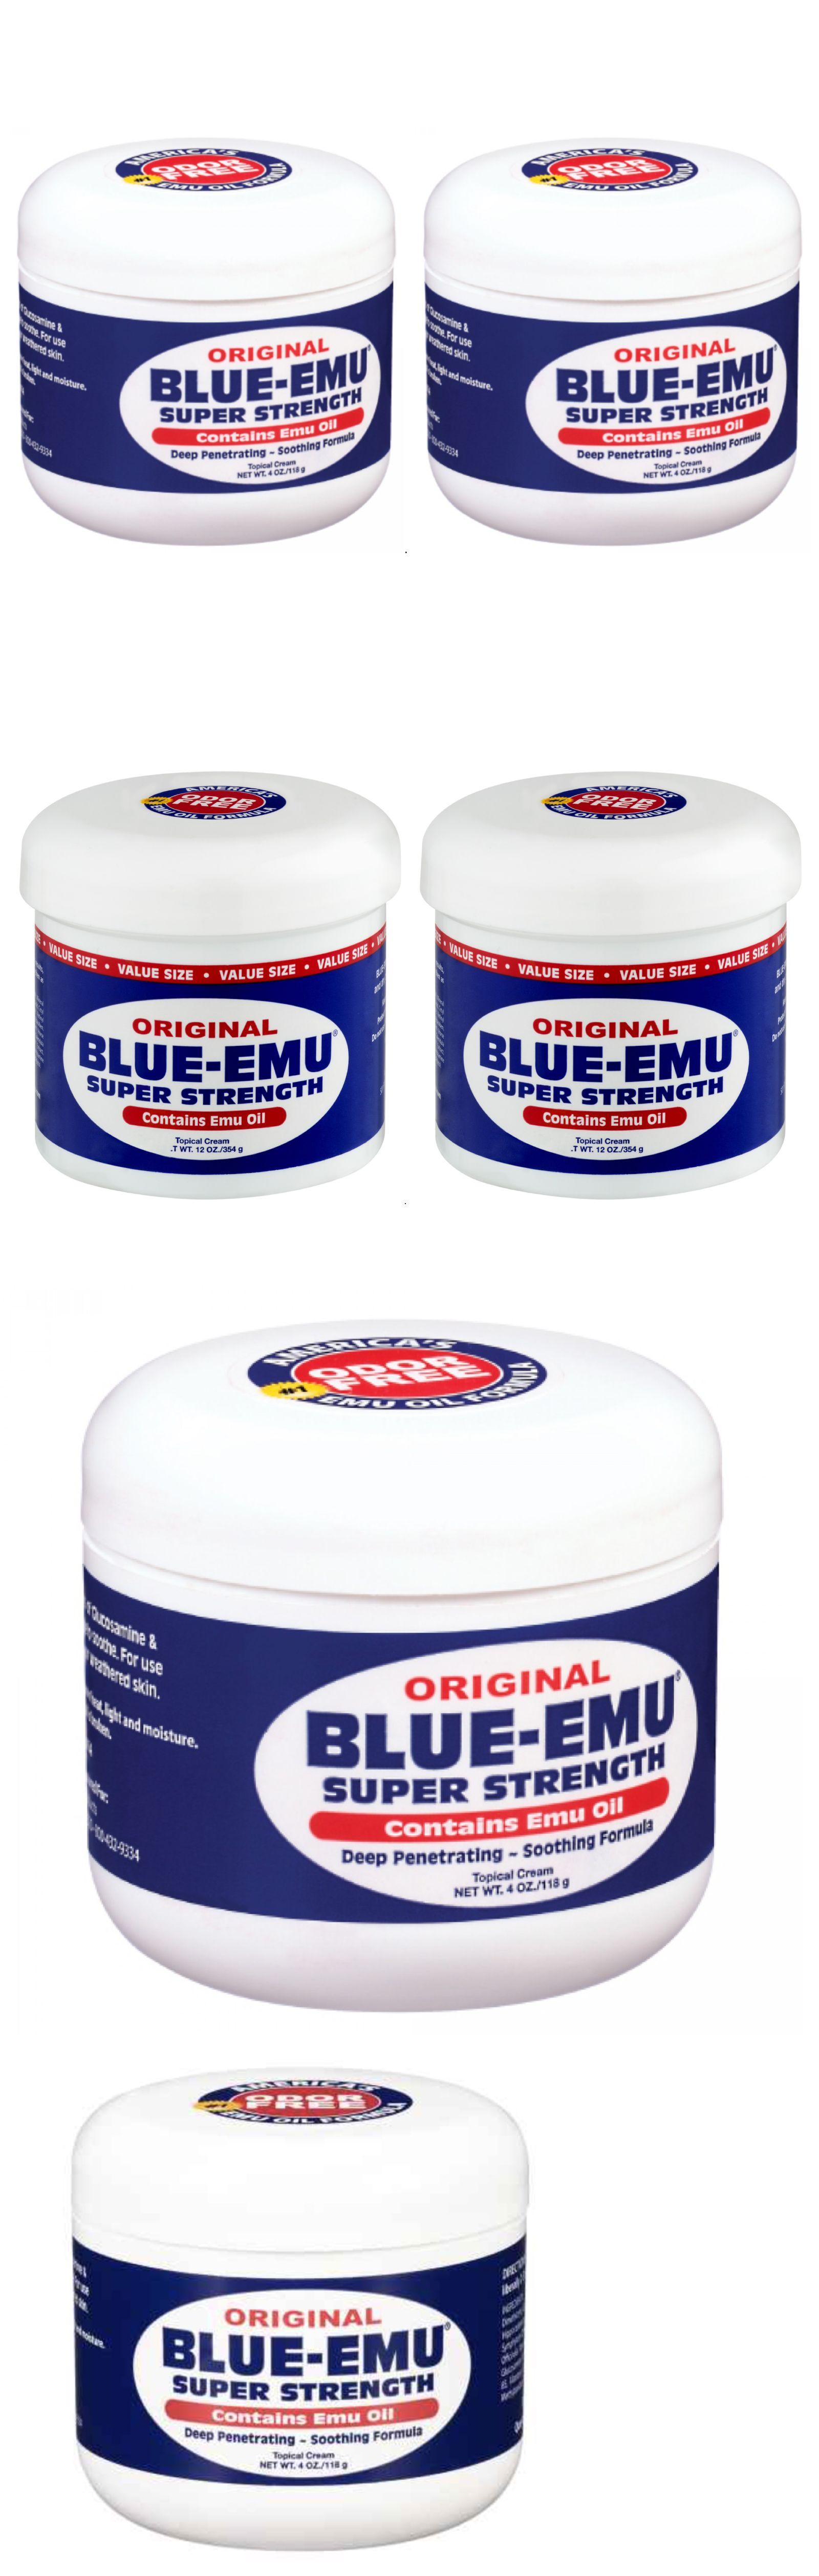 2 Pack Blue Emu Oil Super Strength Arthritis Pain Relief Cream 2x 4